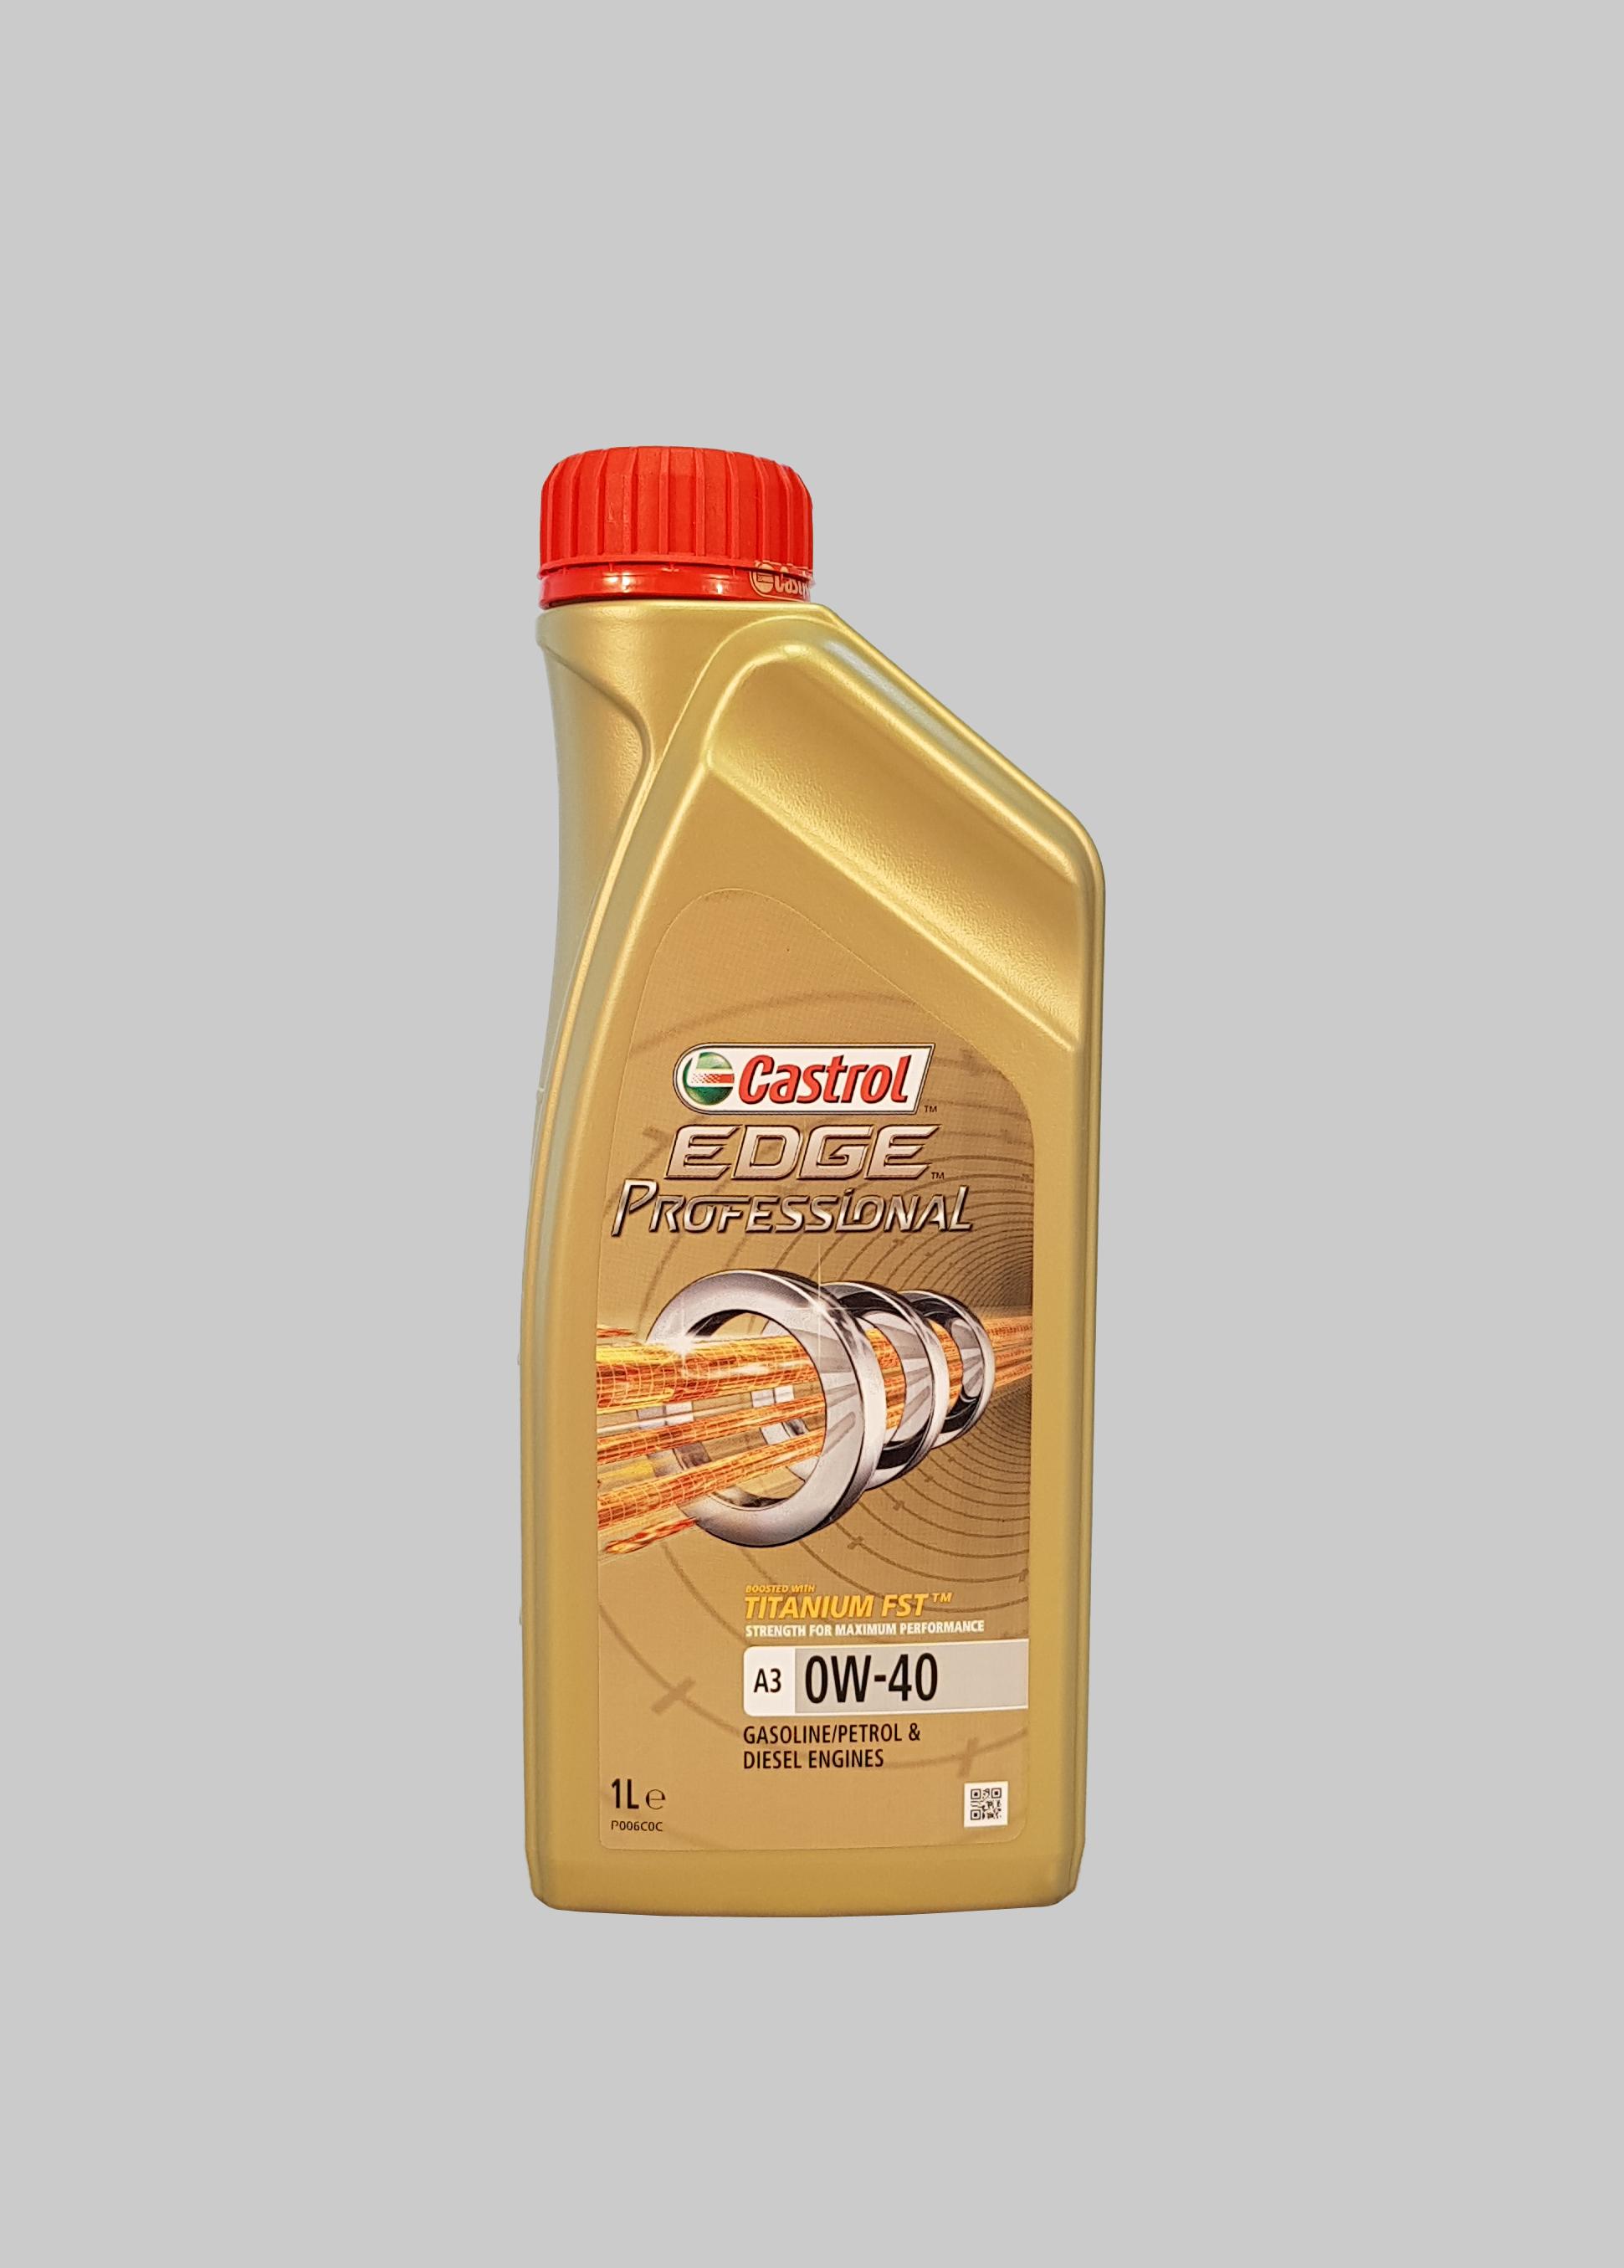 Castrol Edge Professional Titanium FST A3 0W-40 1 Liter